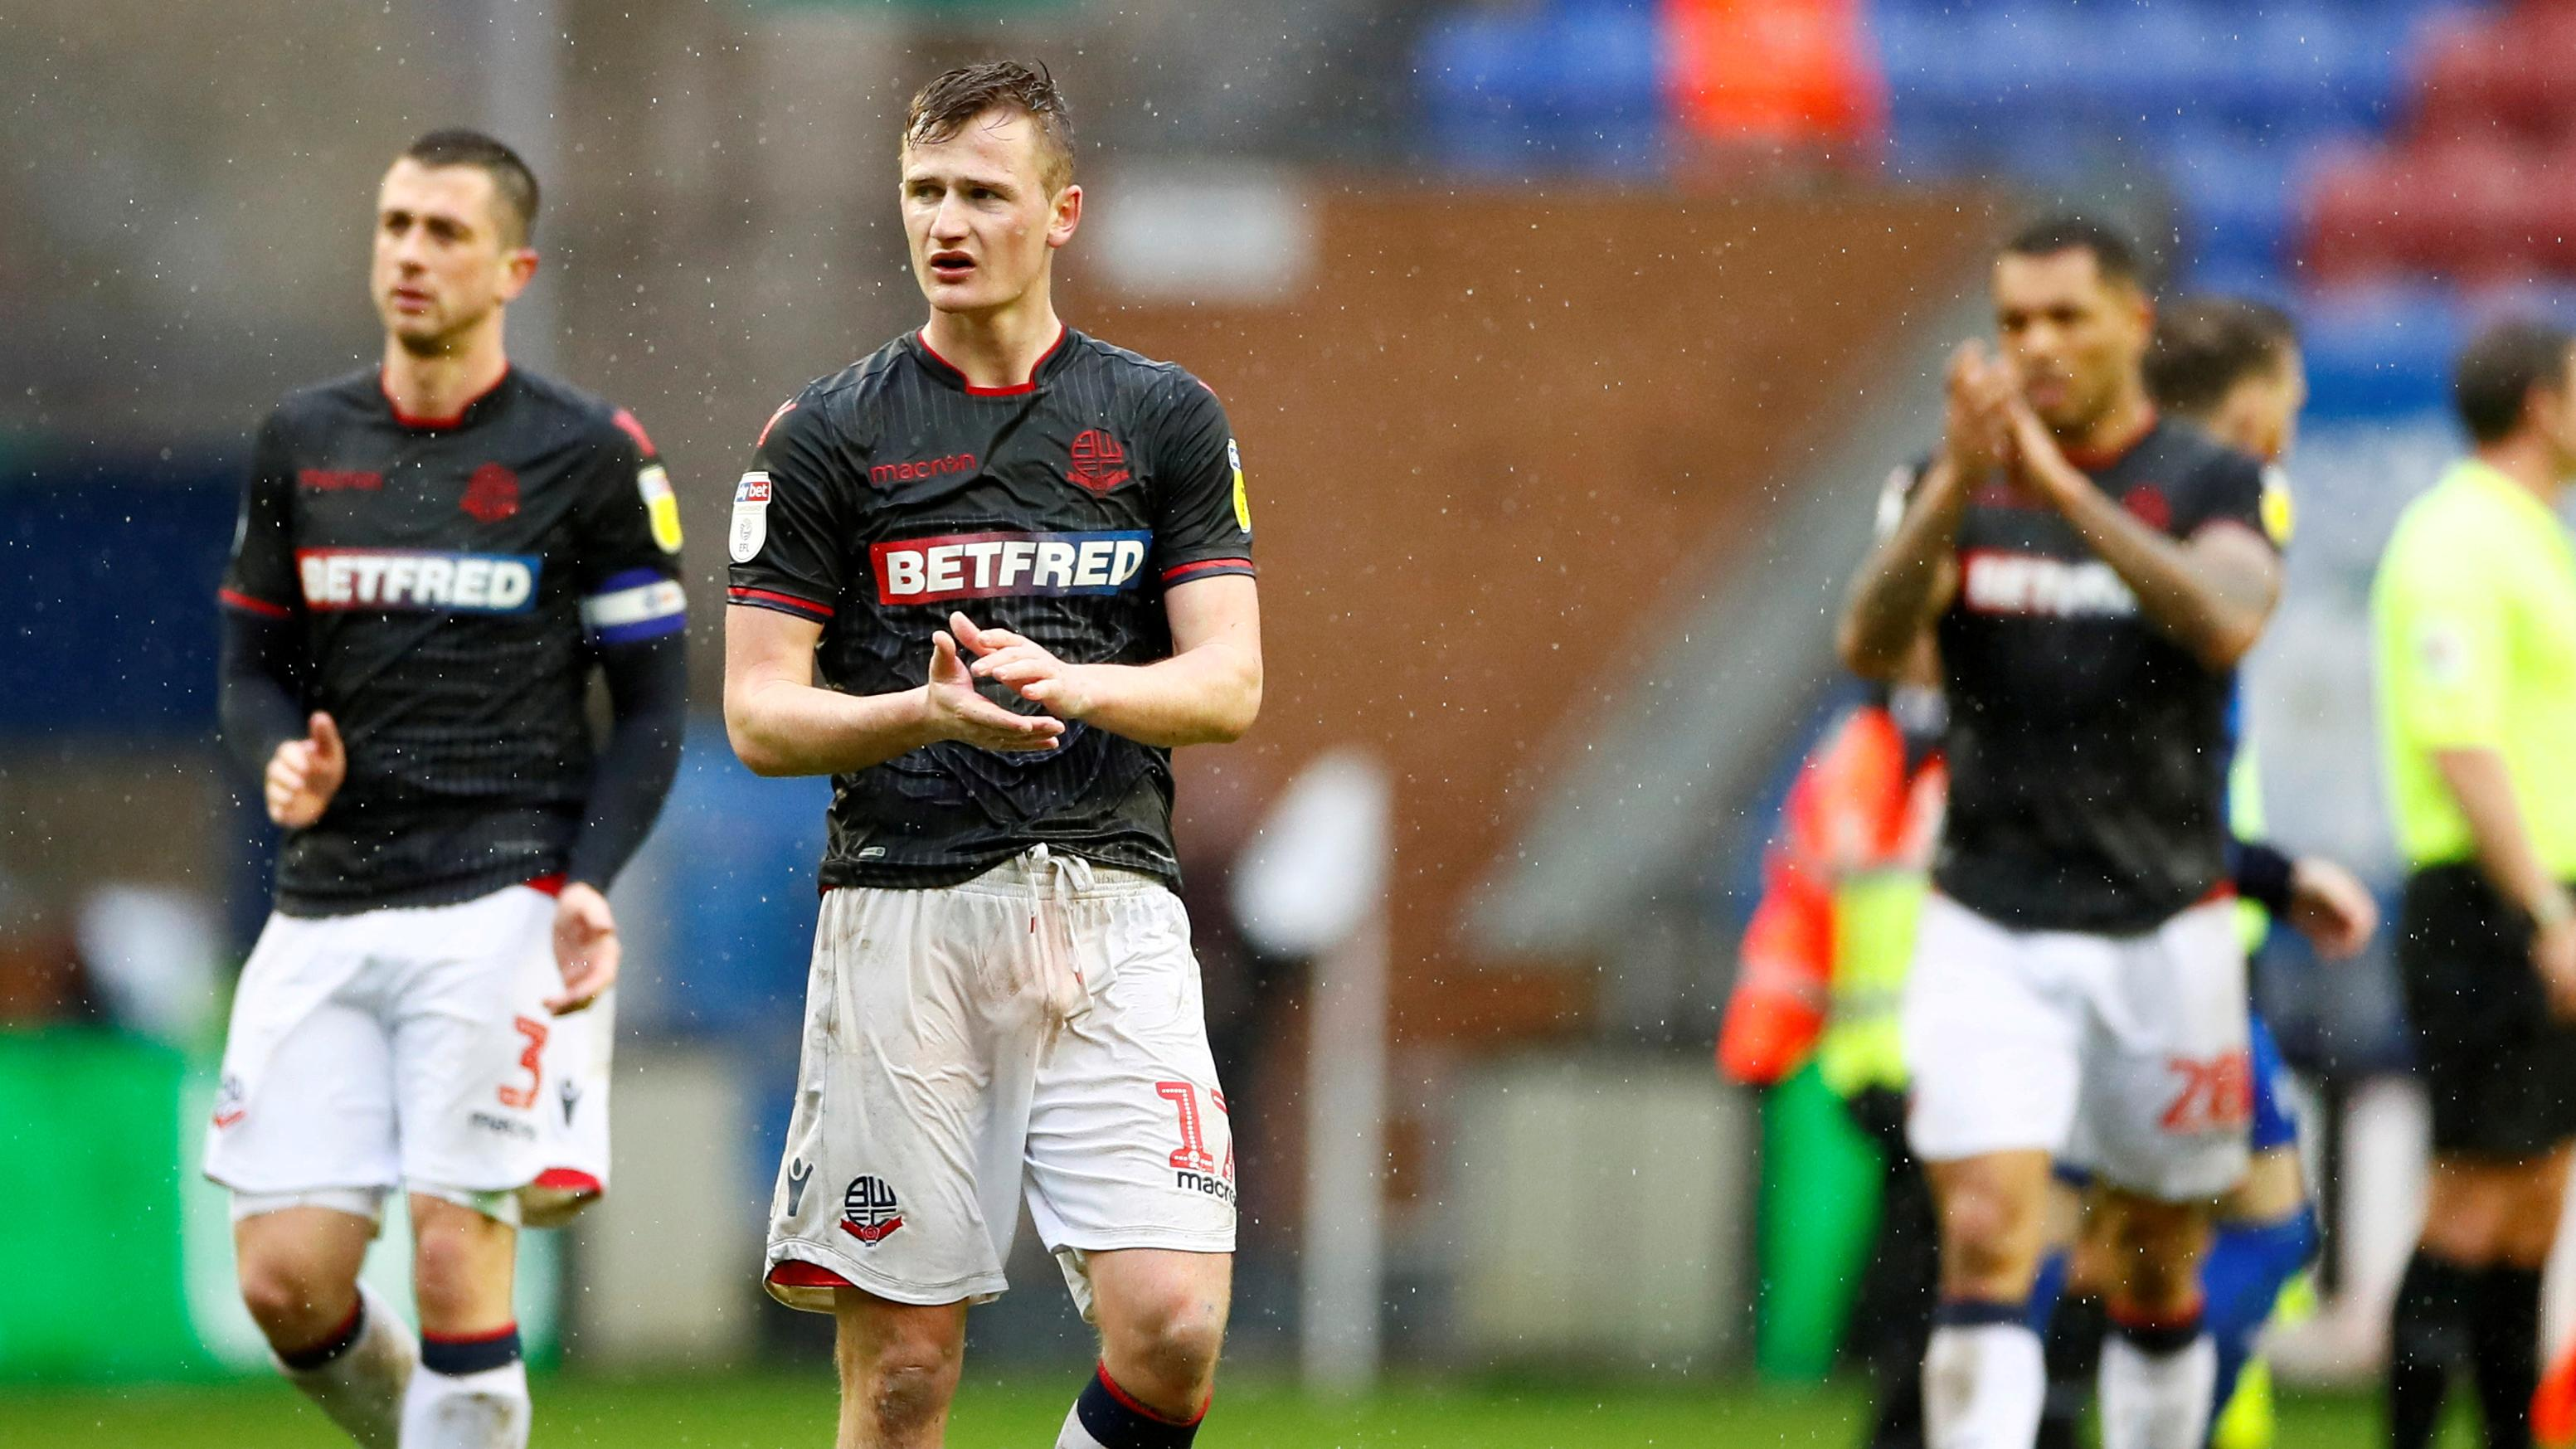 Okocha's former club Bolton Wanderers' players go on strike